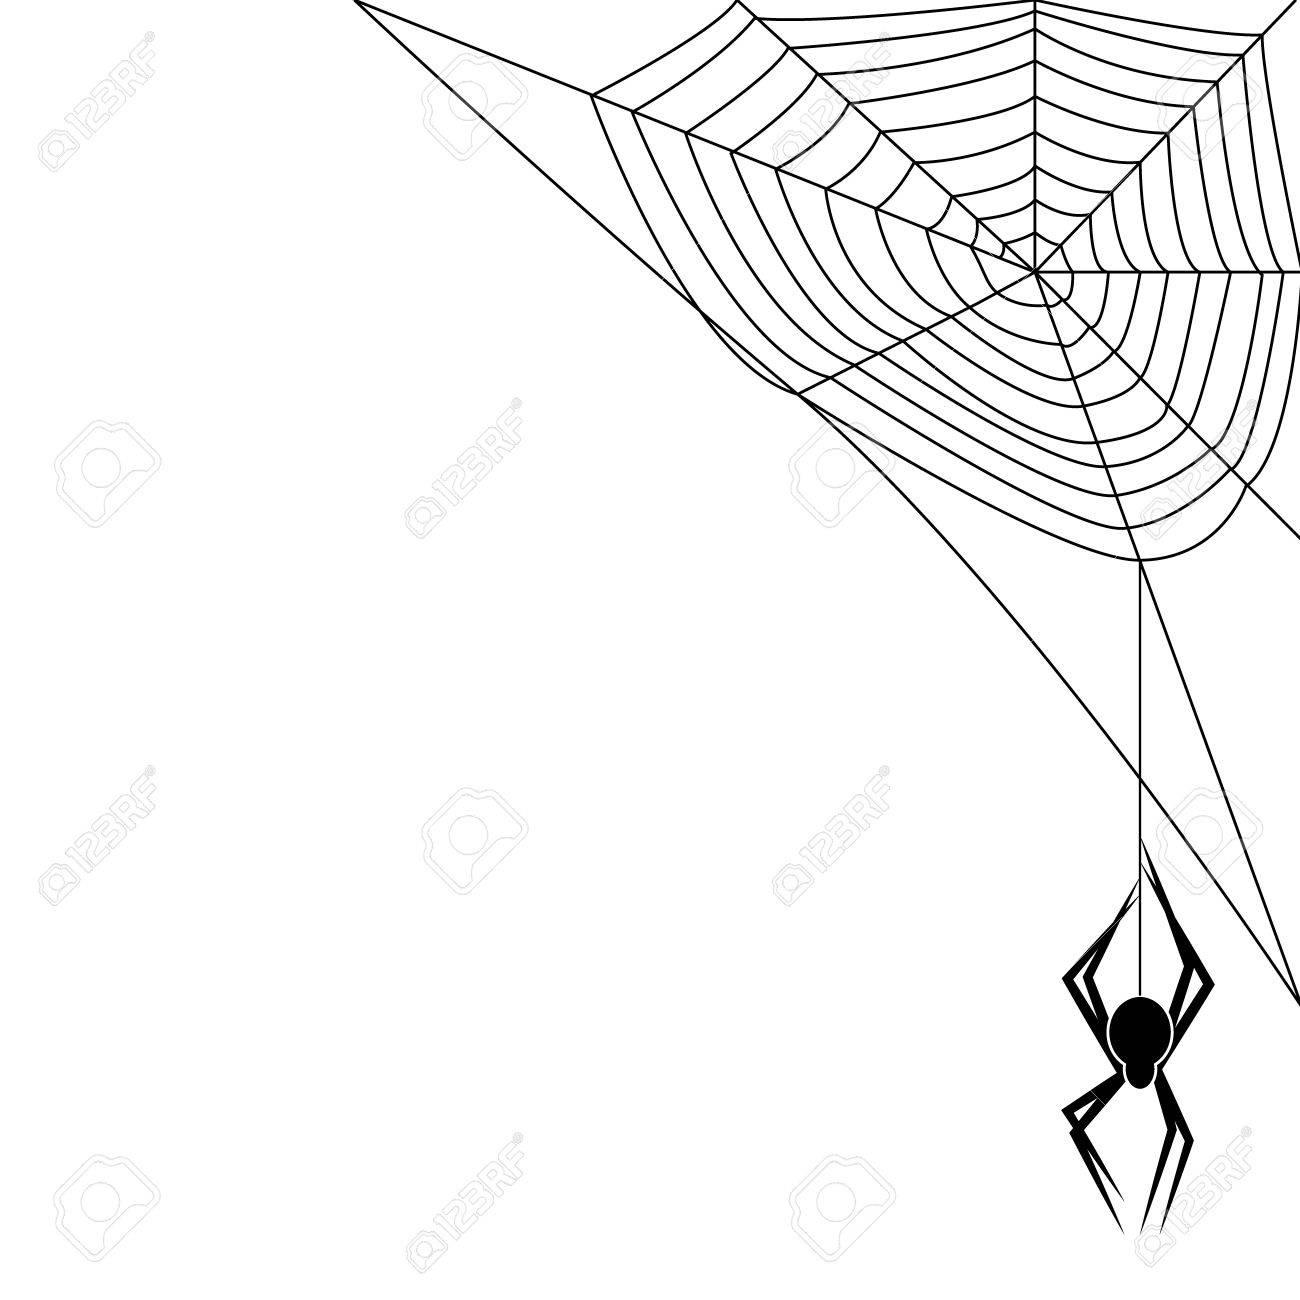 Spider Stock Vector - 14460739